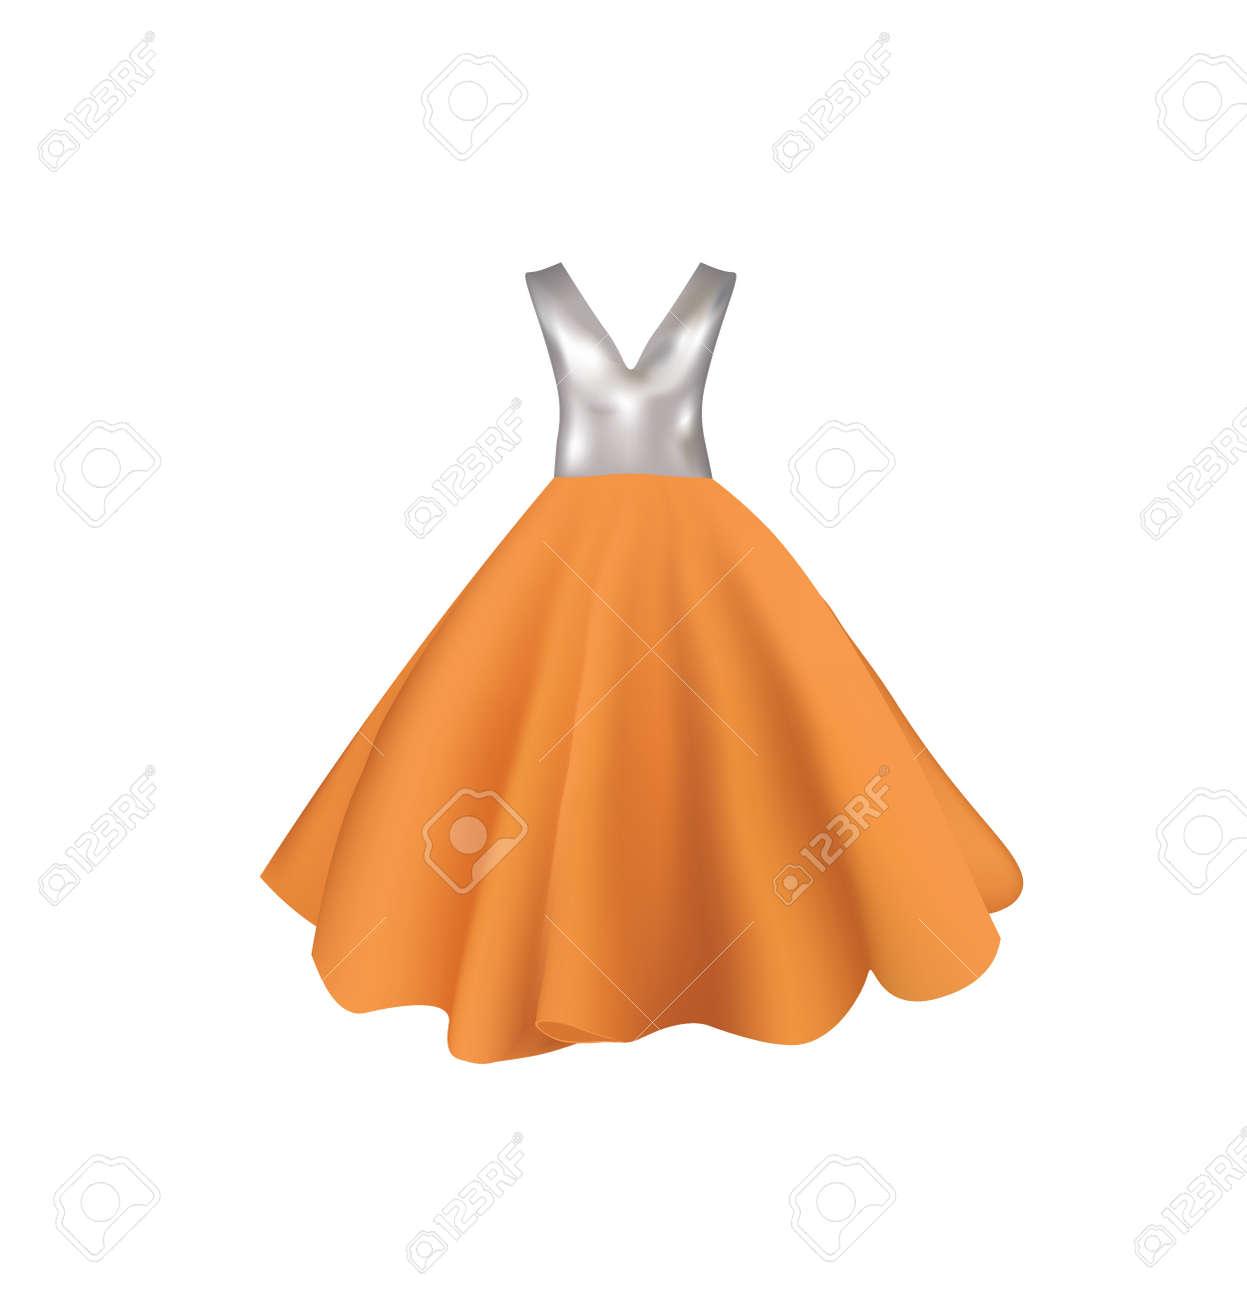 Orange and gray dress, vector - 164201990